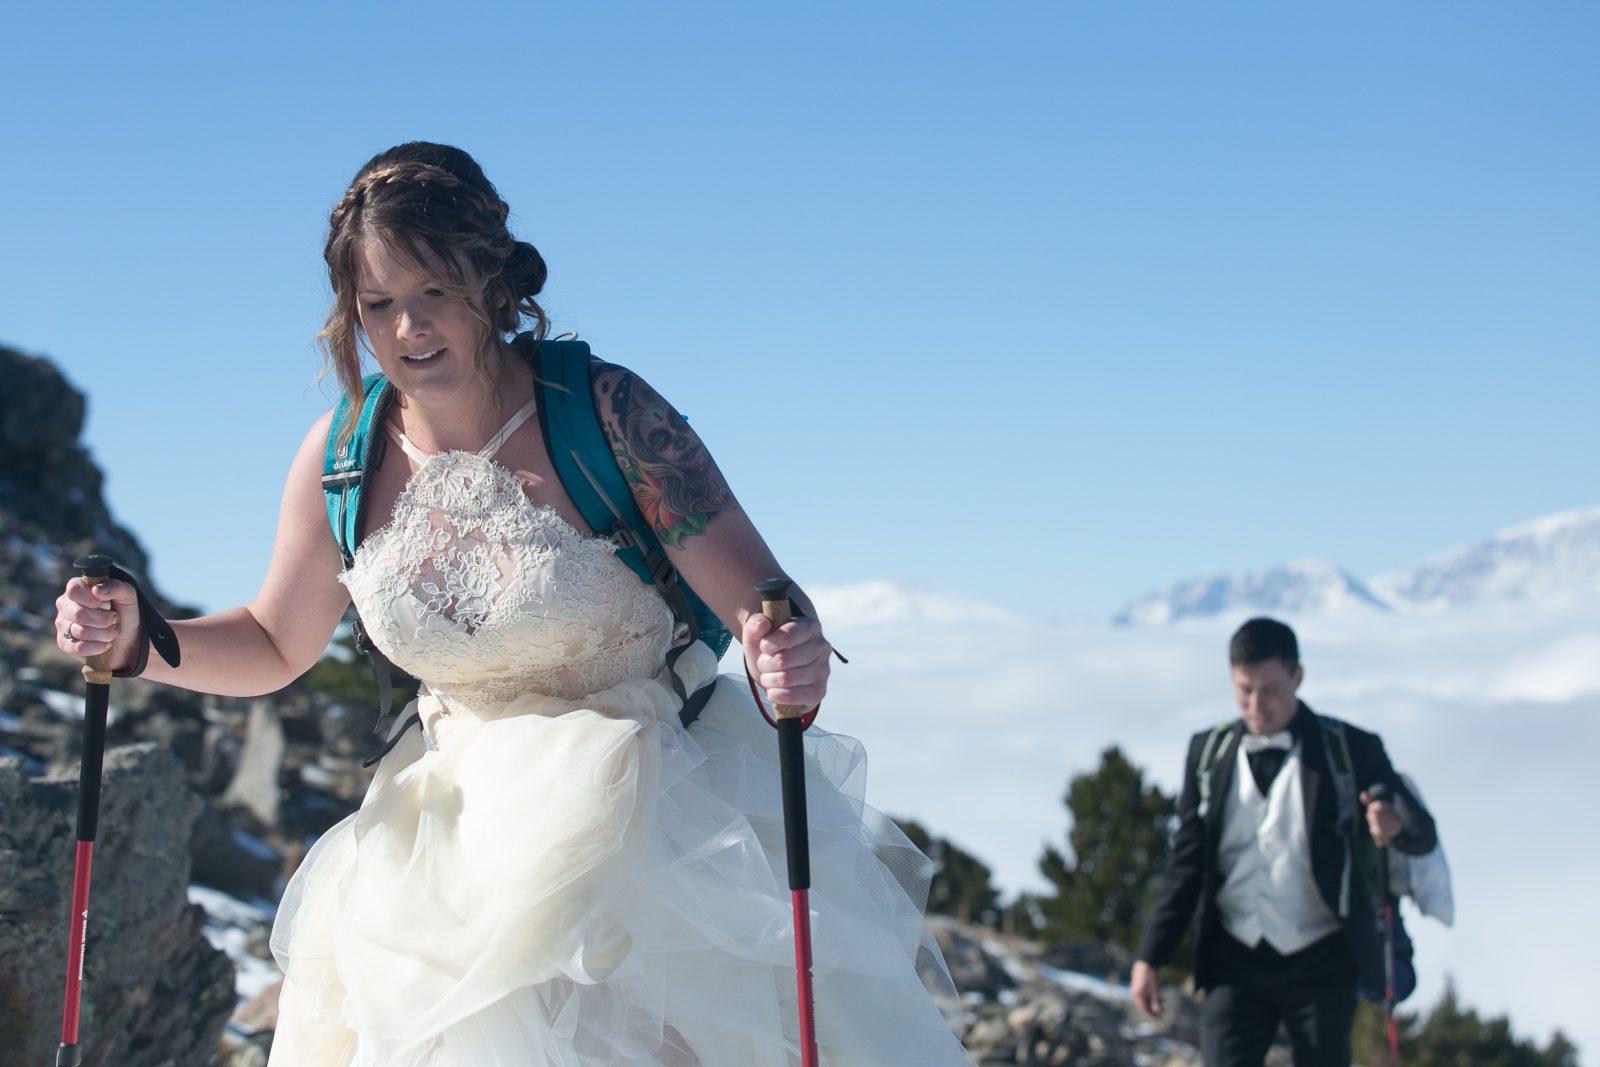 Arrance, Colorado, Estes Park, Liddell, Lindsay, Peak, Peaks, Thomas, Tom, Twin Sisters, autumn, destination, hike, snow, wedding